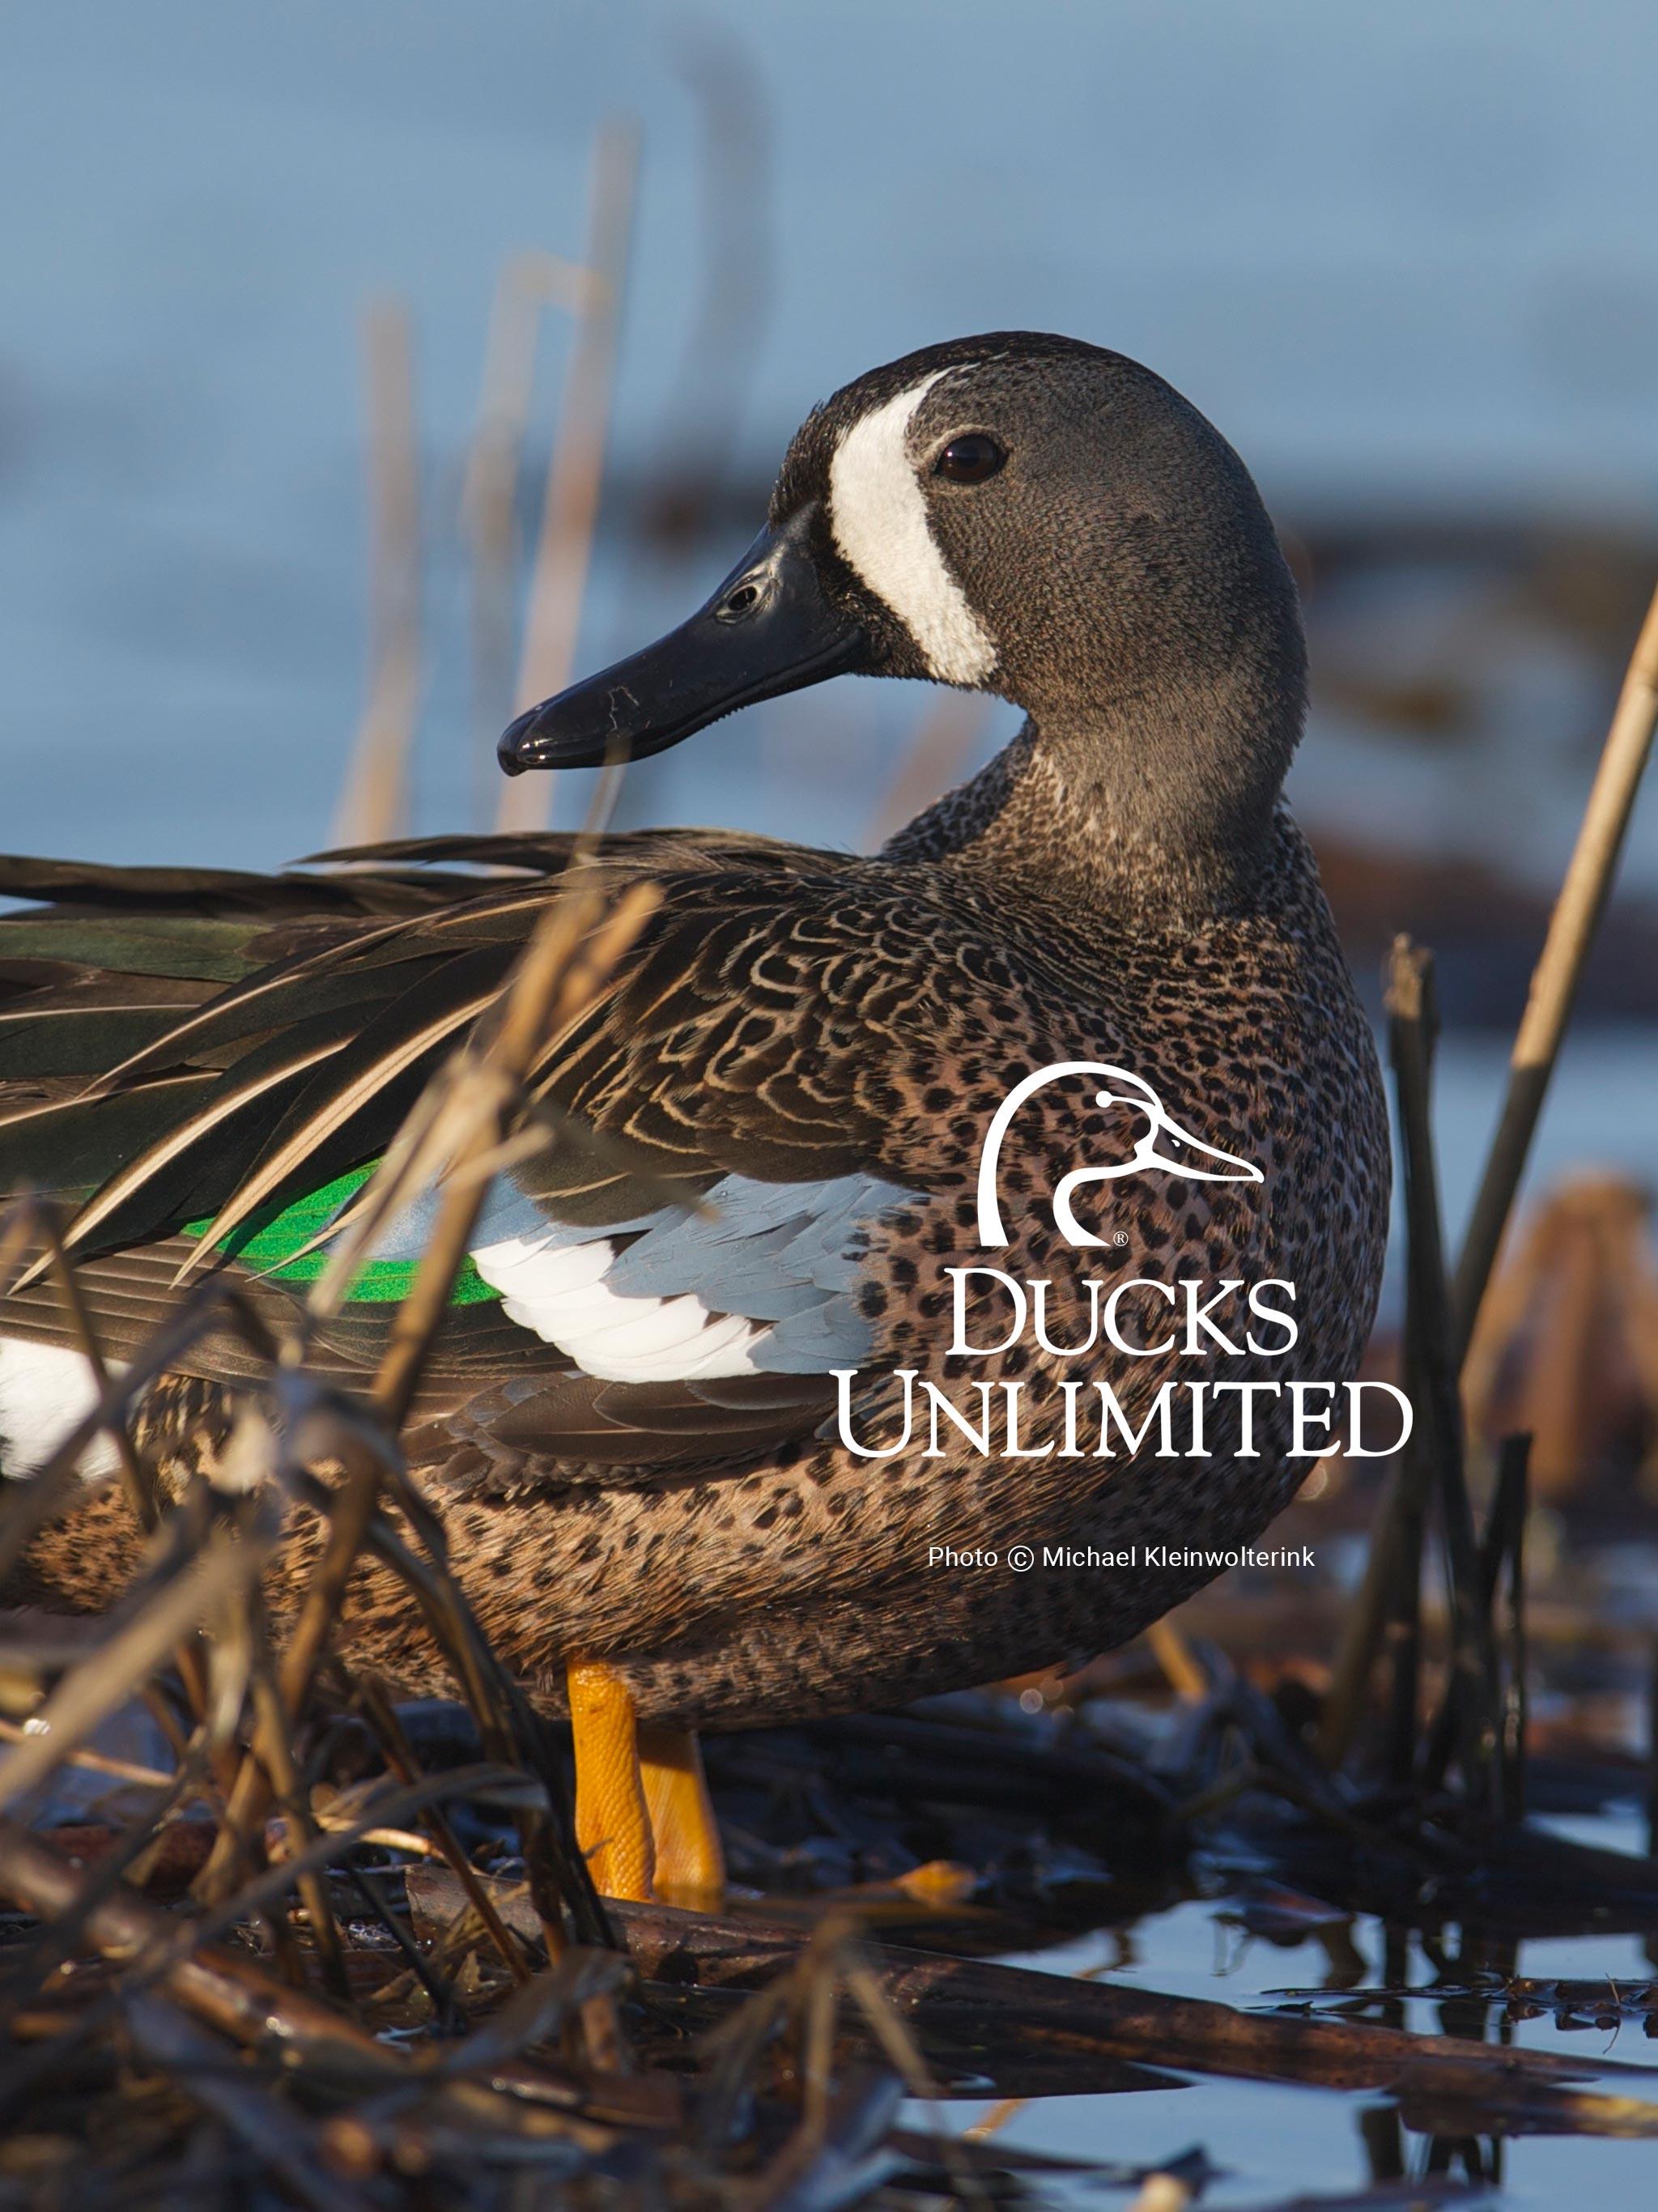 Goose Hunting Wallpaper - Duck Hunting Wallpaper For Iphone - HD Wallpaper